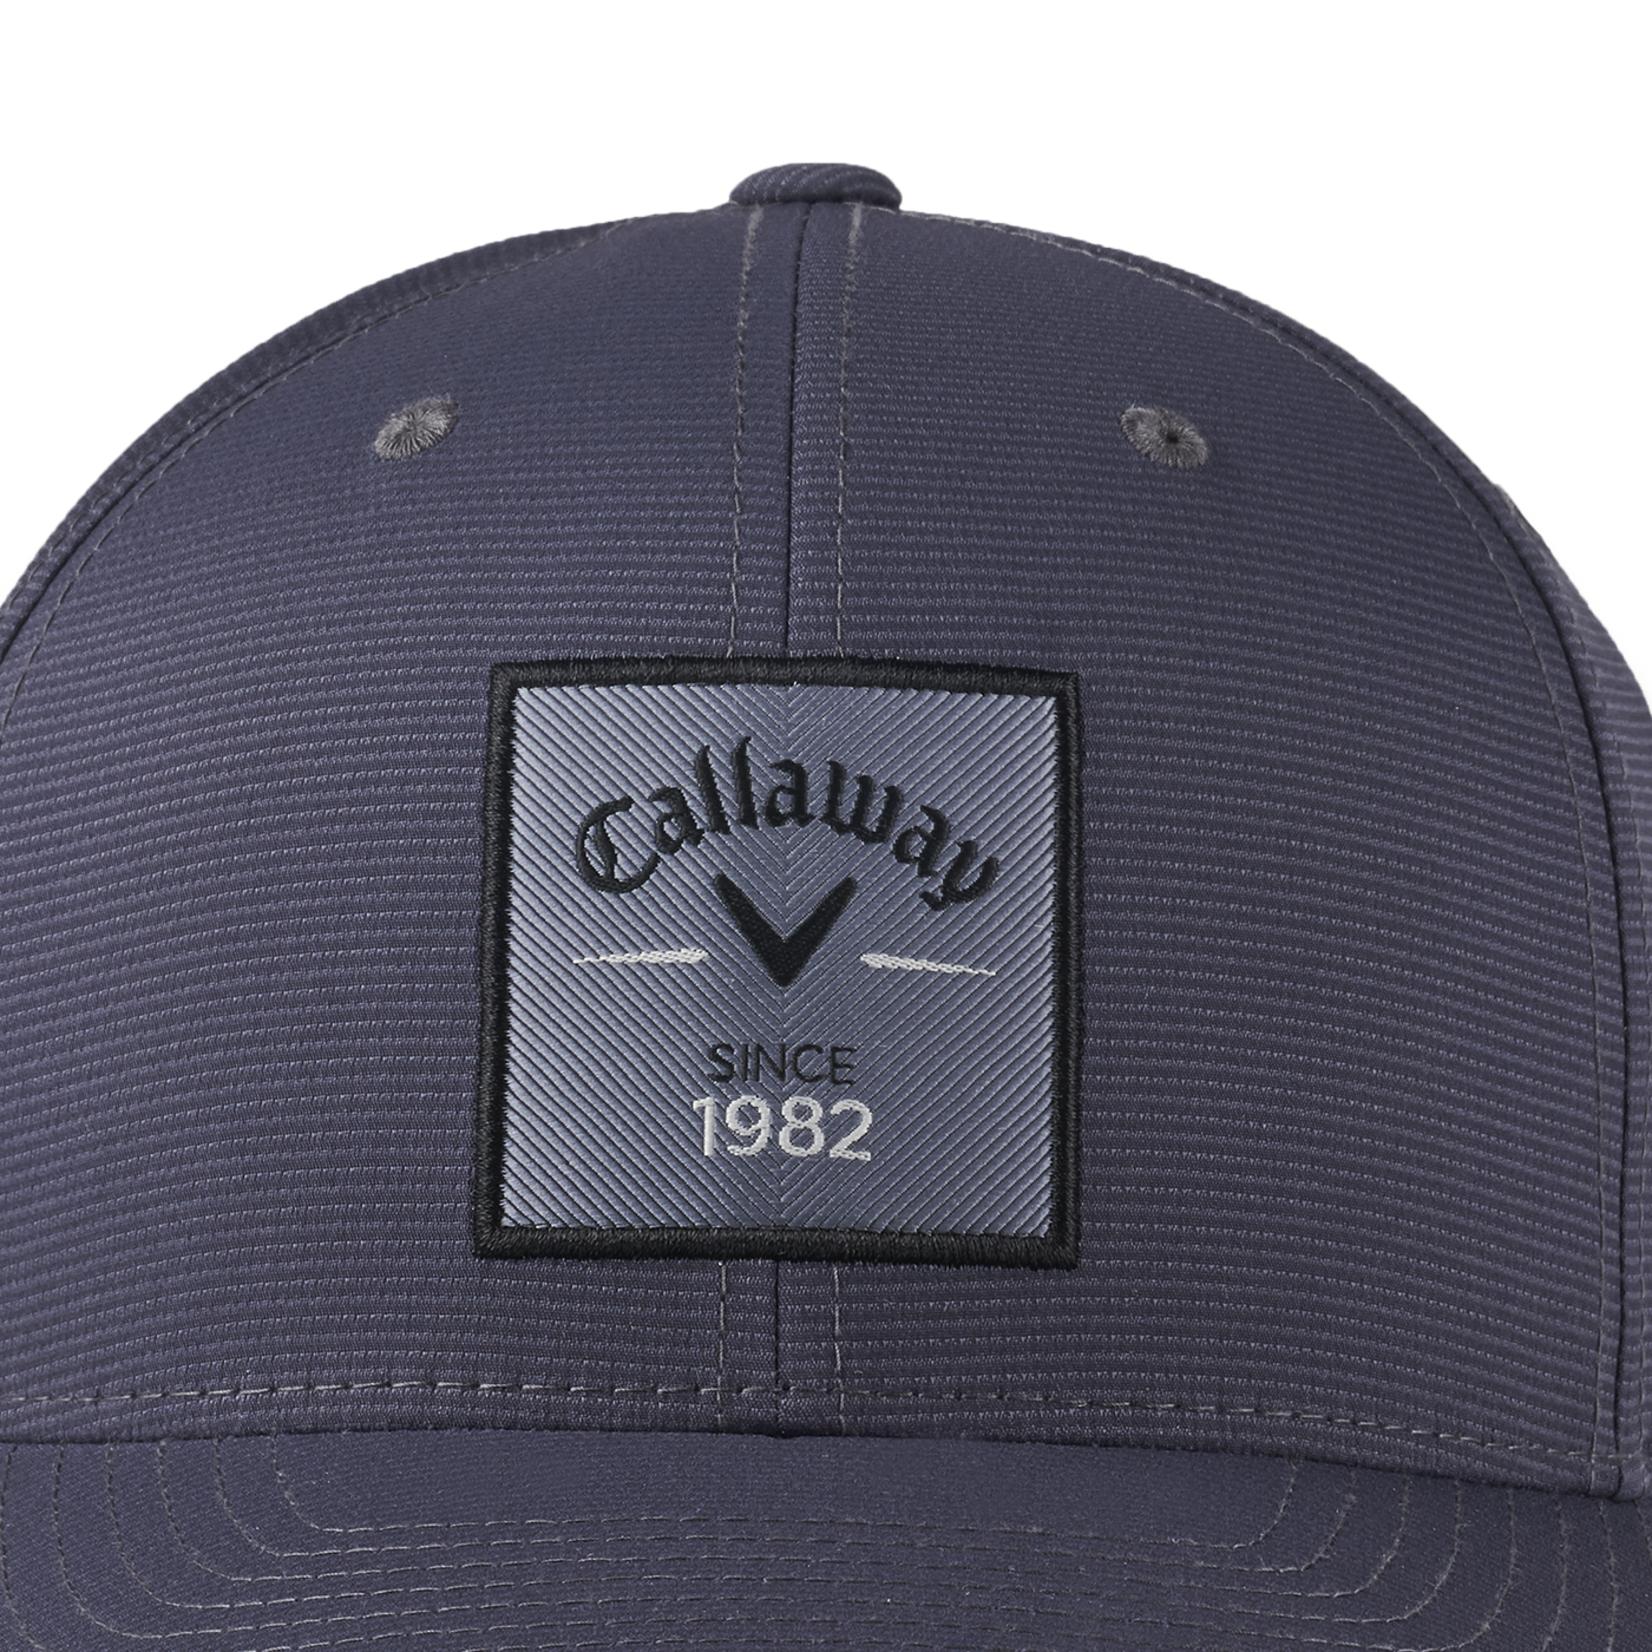 Callaway Callaway Rutherford Cap Charcoal